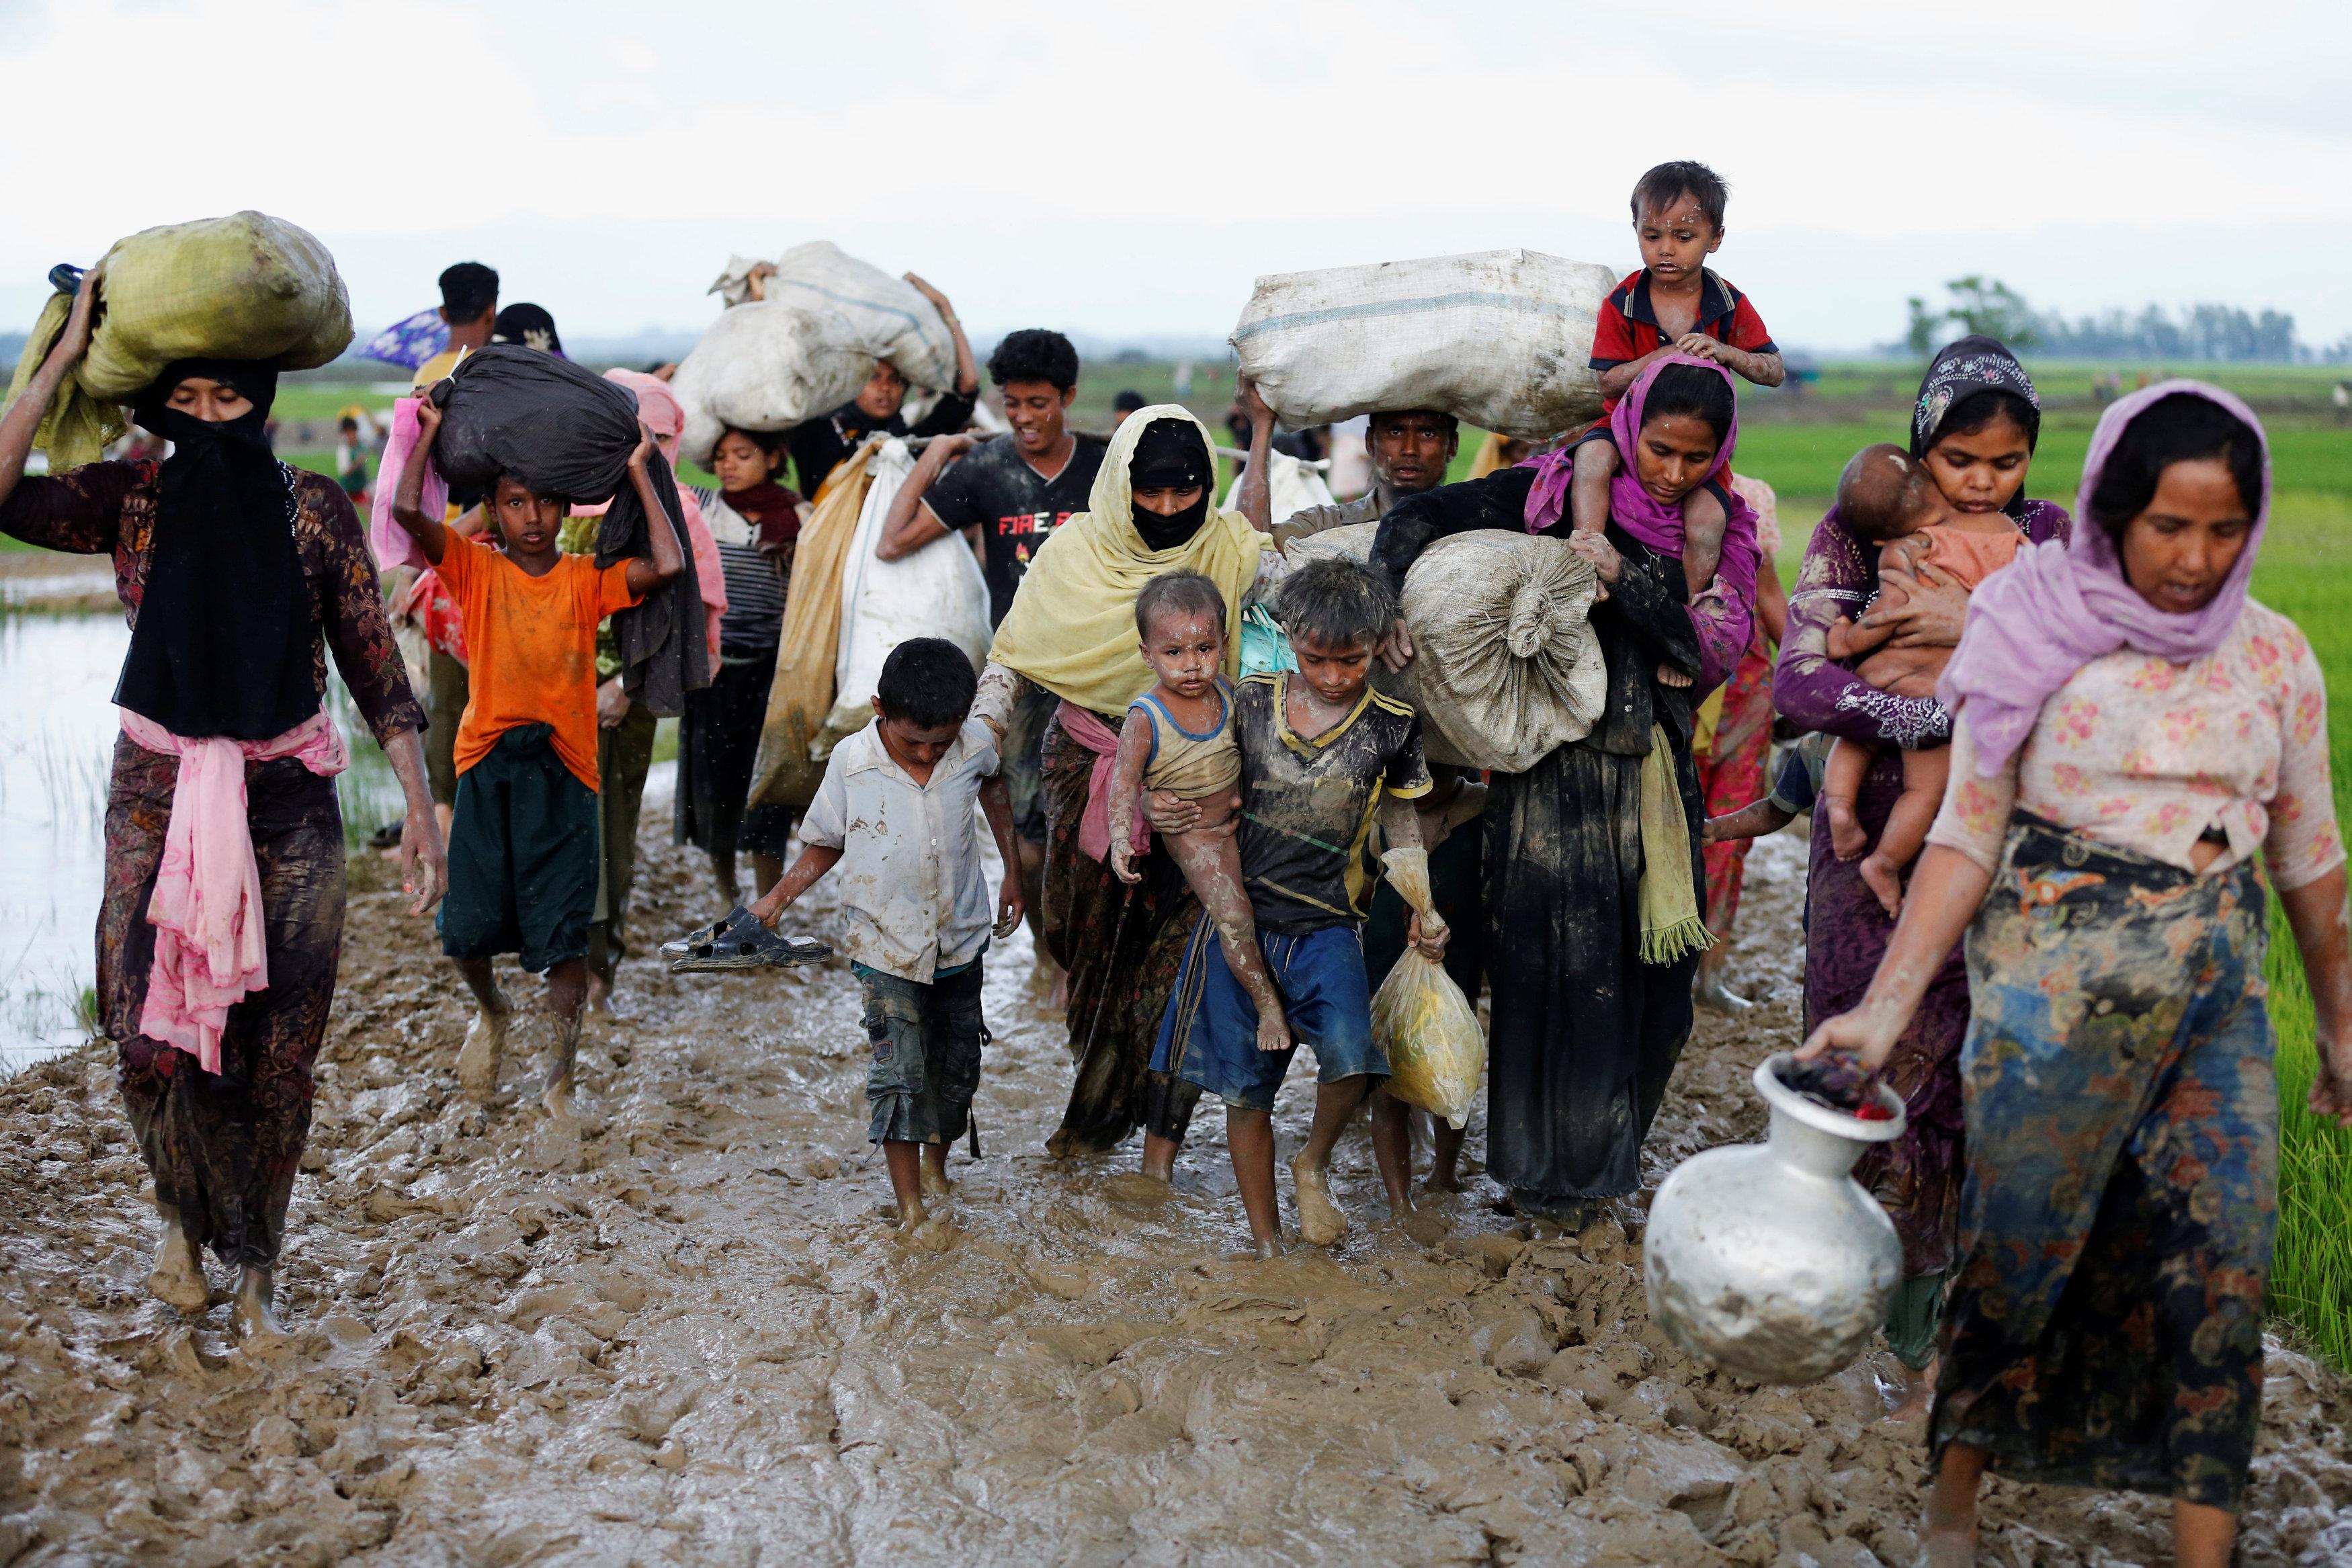 Rohingyas flee as more than 2,600 houses burned in Myanmar's Rakhine state